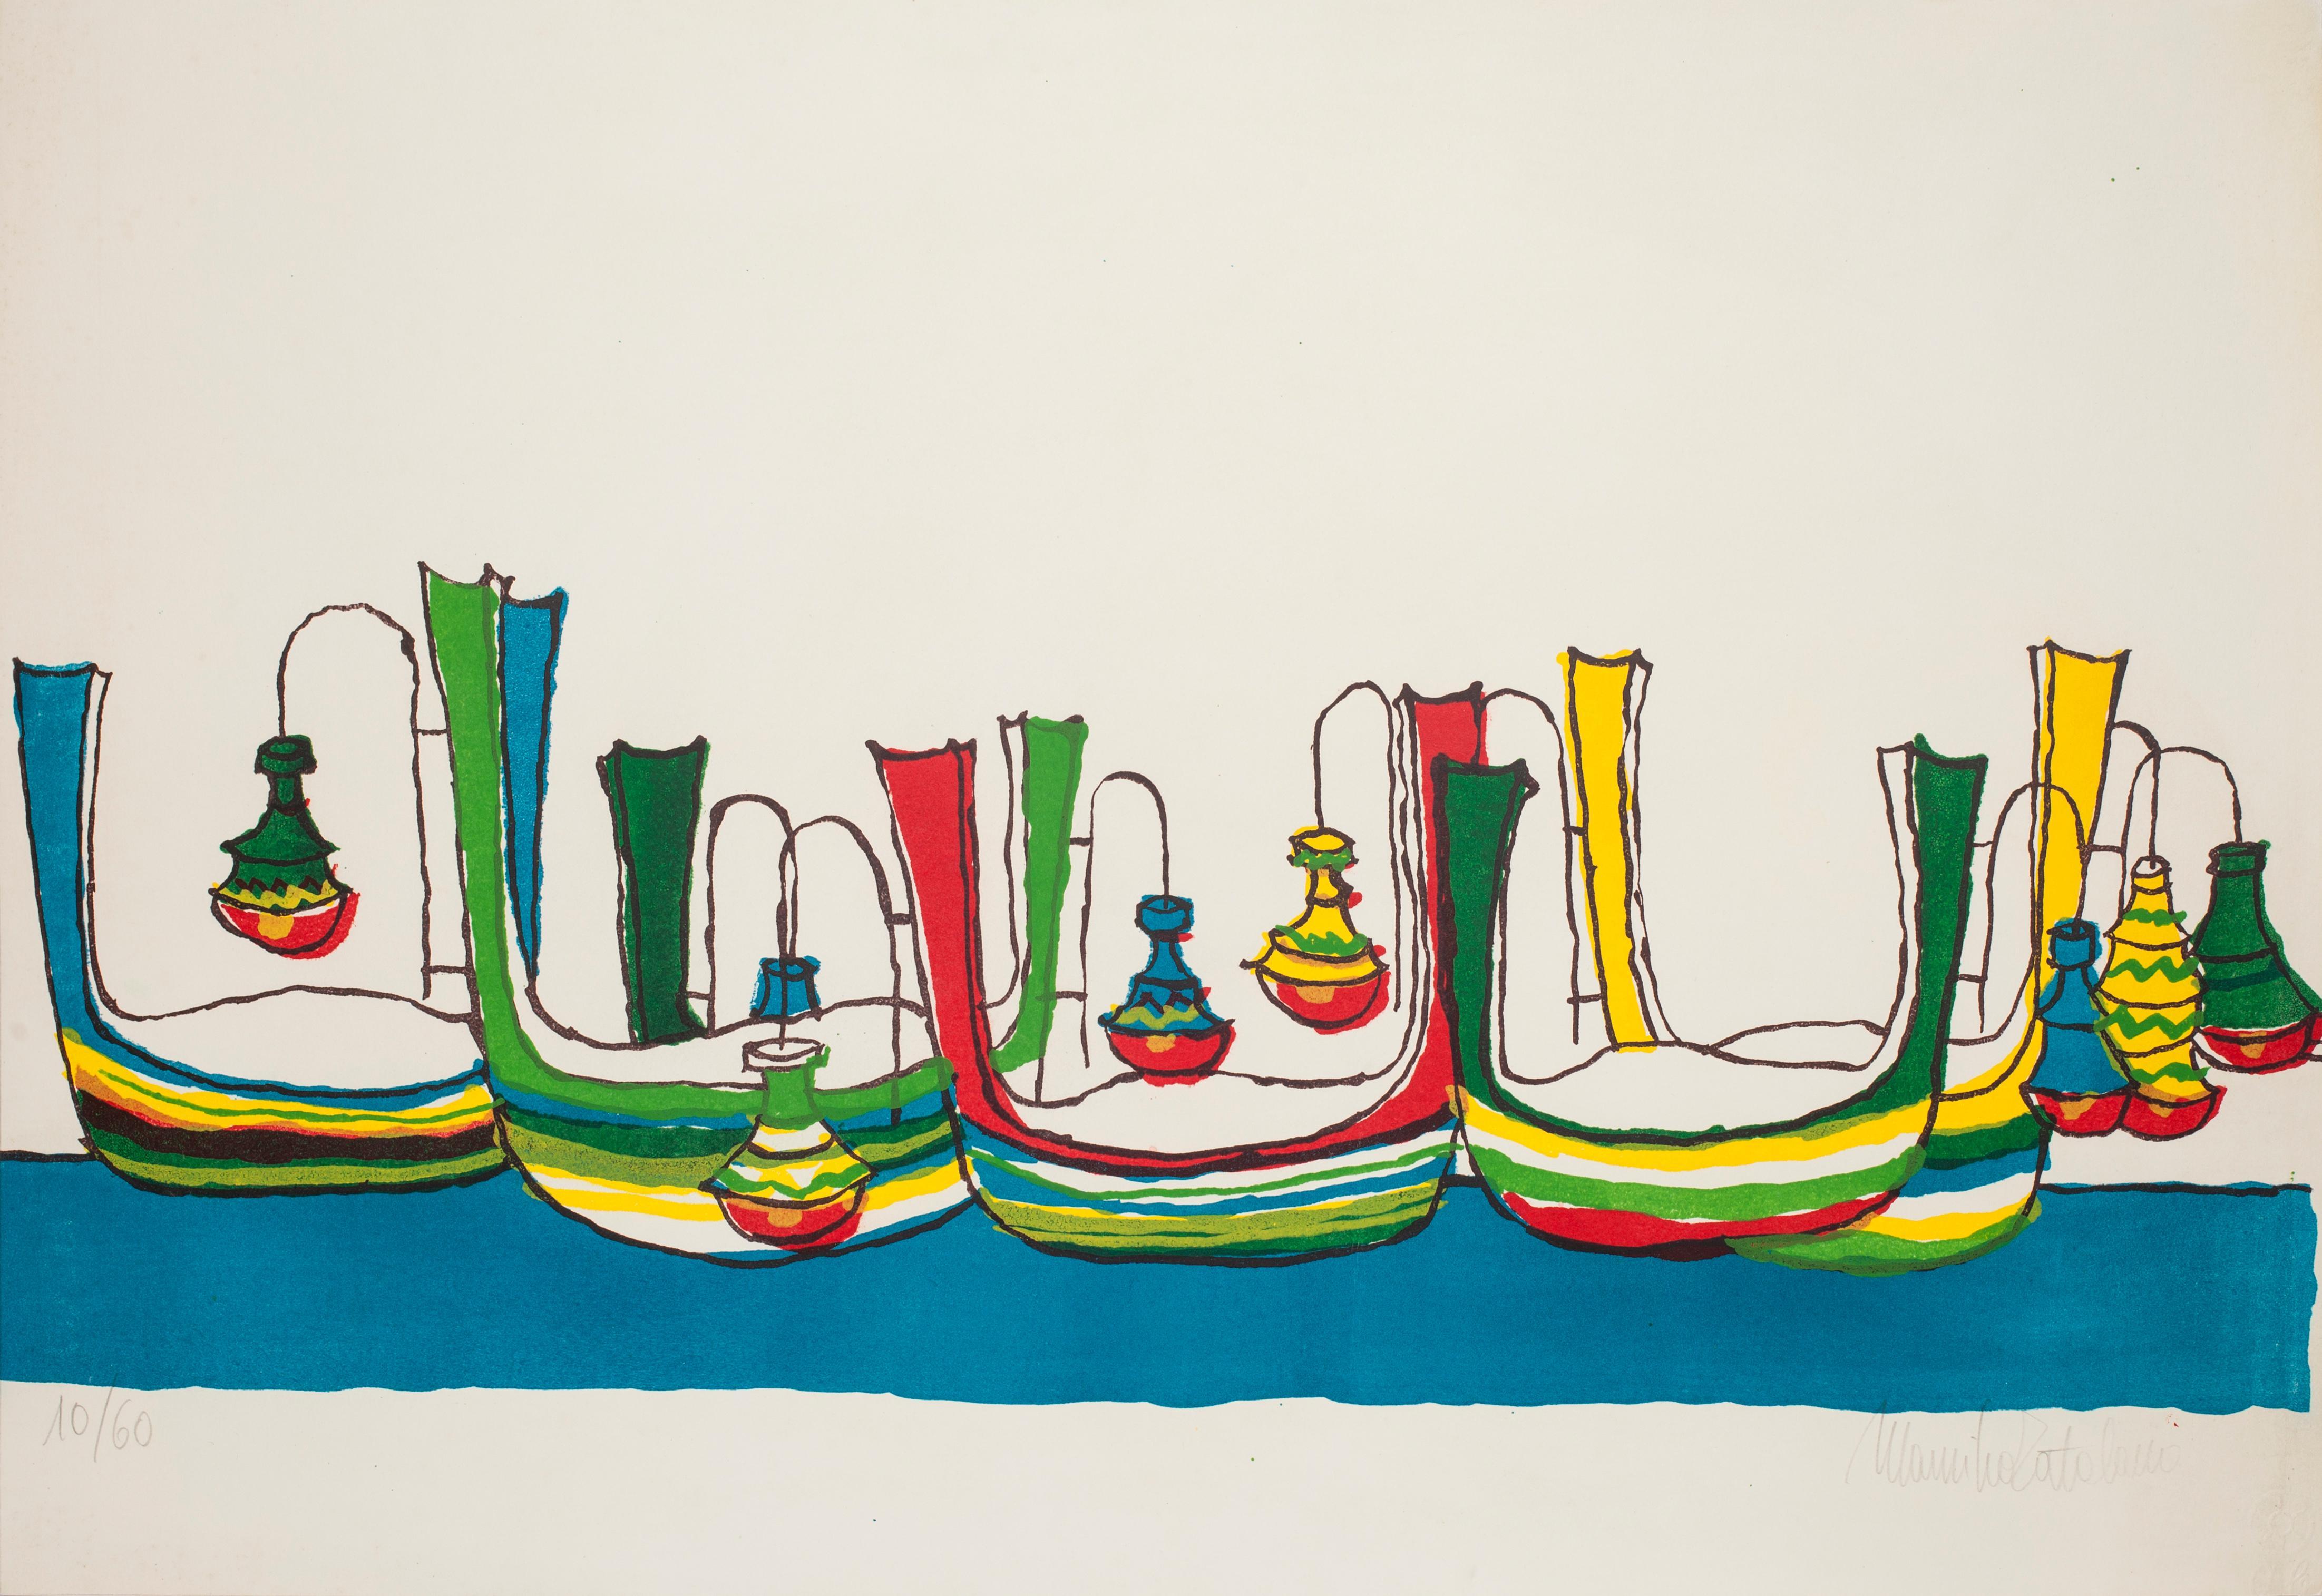 Gondolas - Original Lithograph by Maurilio Catalano - 1970s